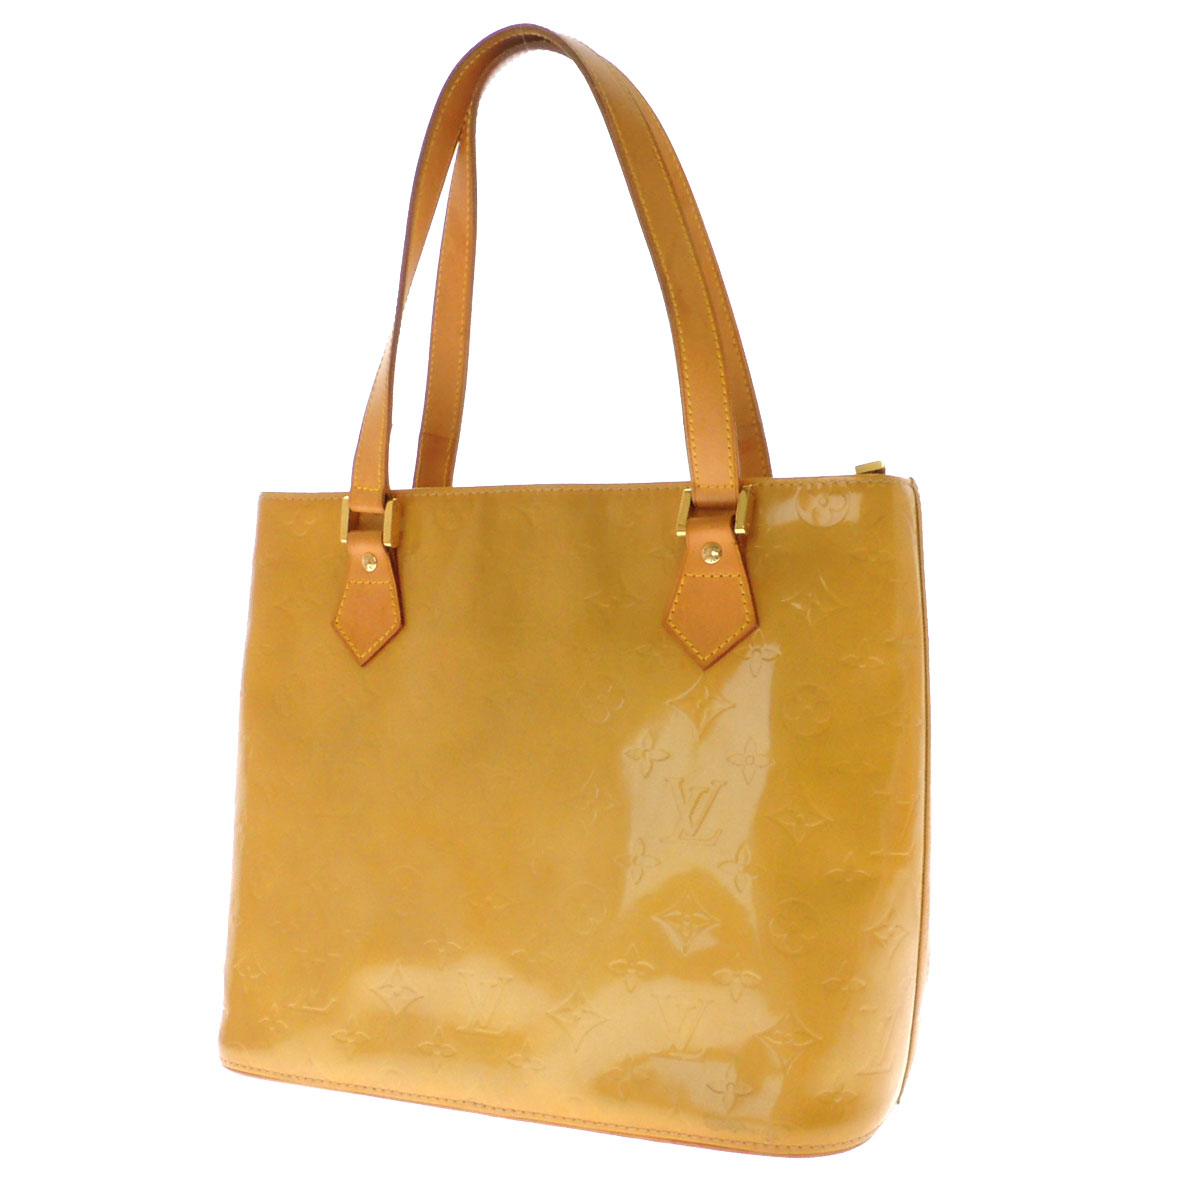 Women's tote bags Monogram Verni, LOUIS VUITTON Houston M91004